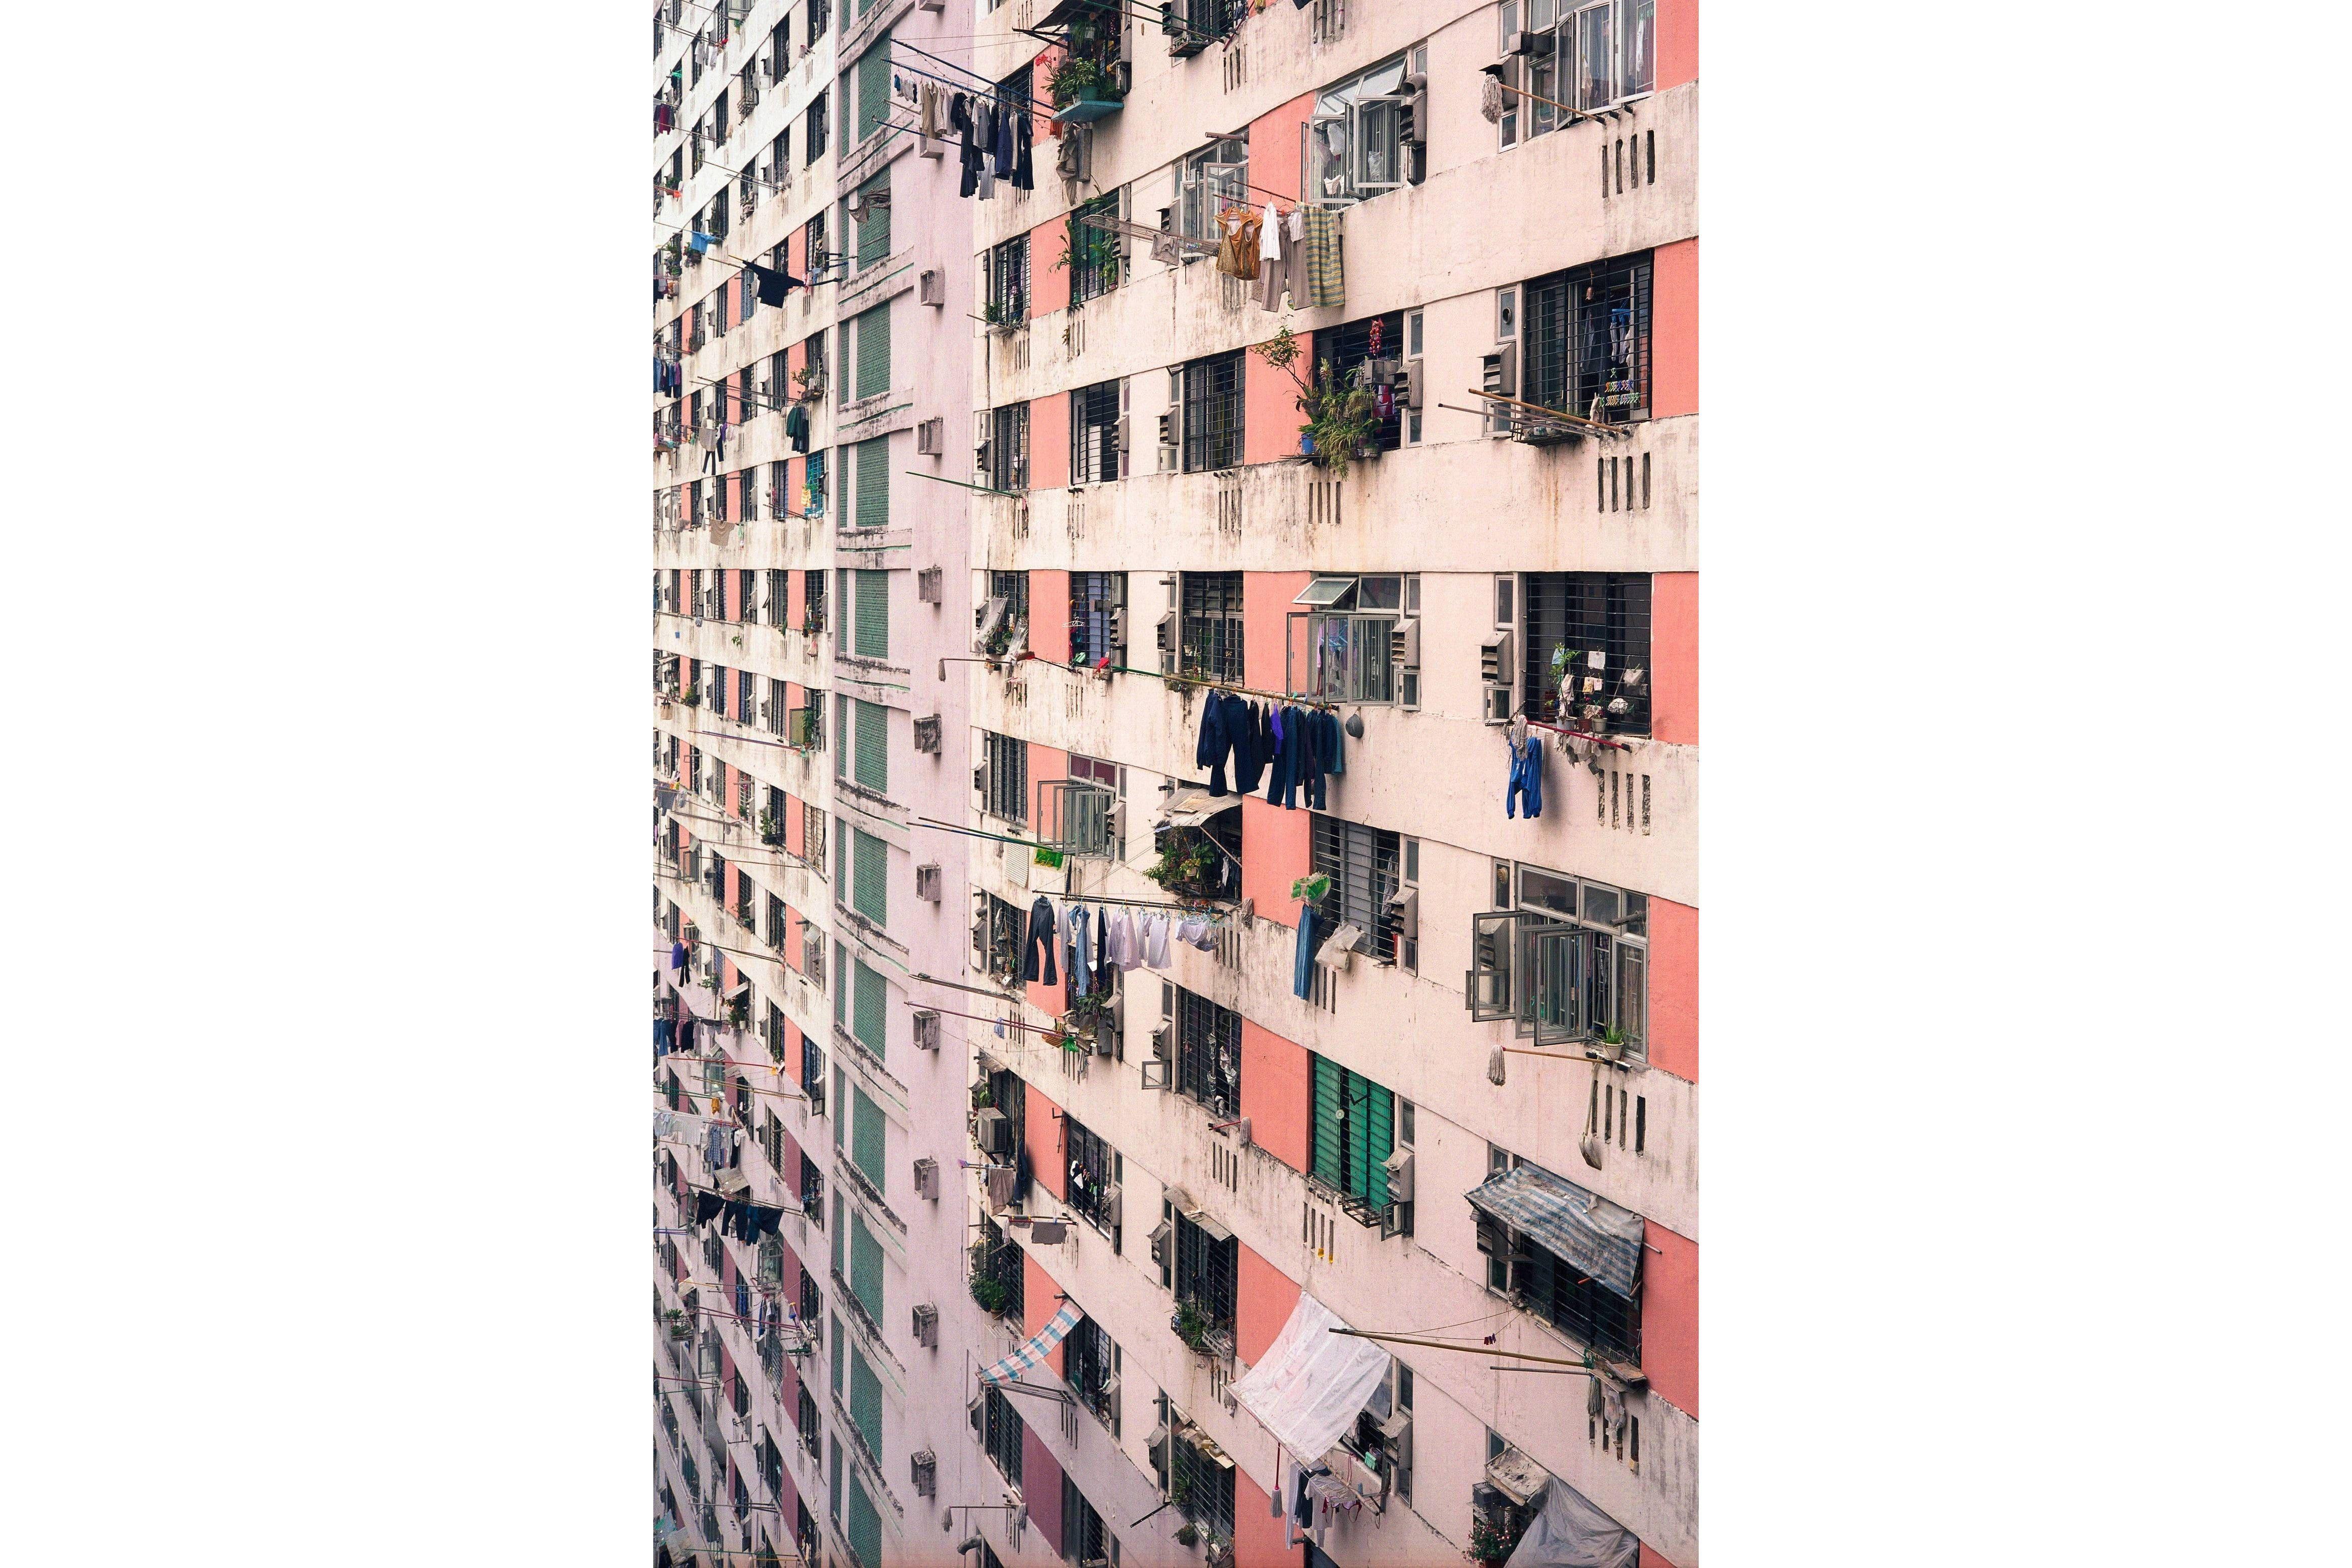 The pink geometric facade of a Hong Kong apartment block